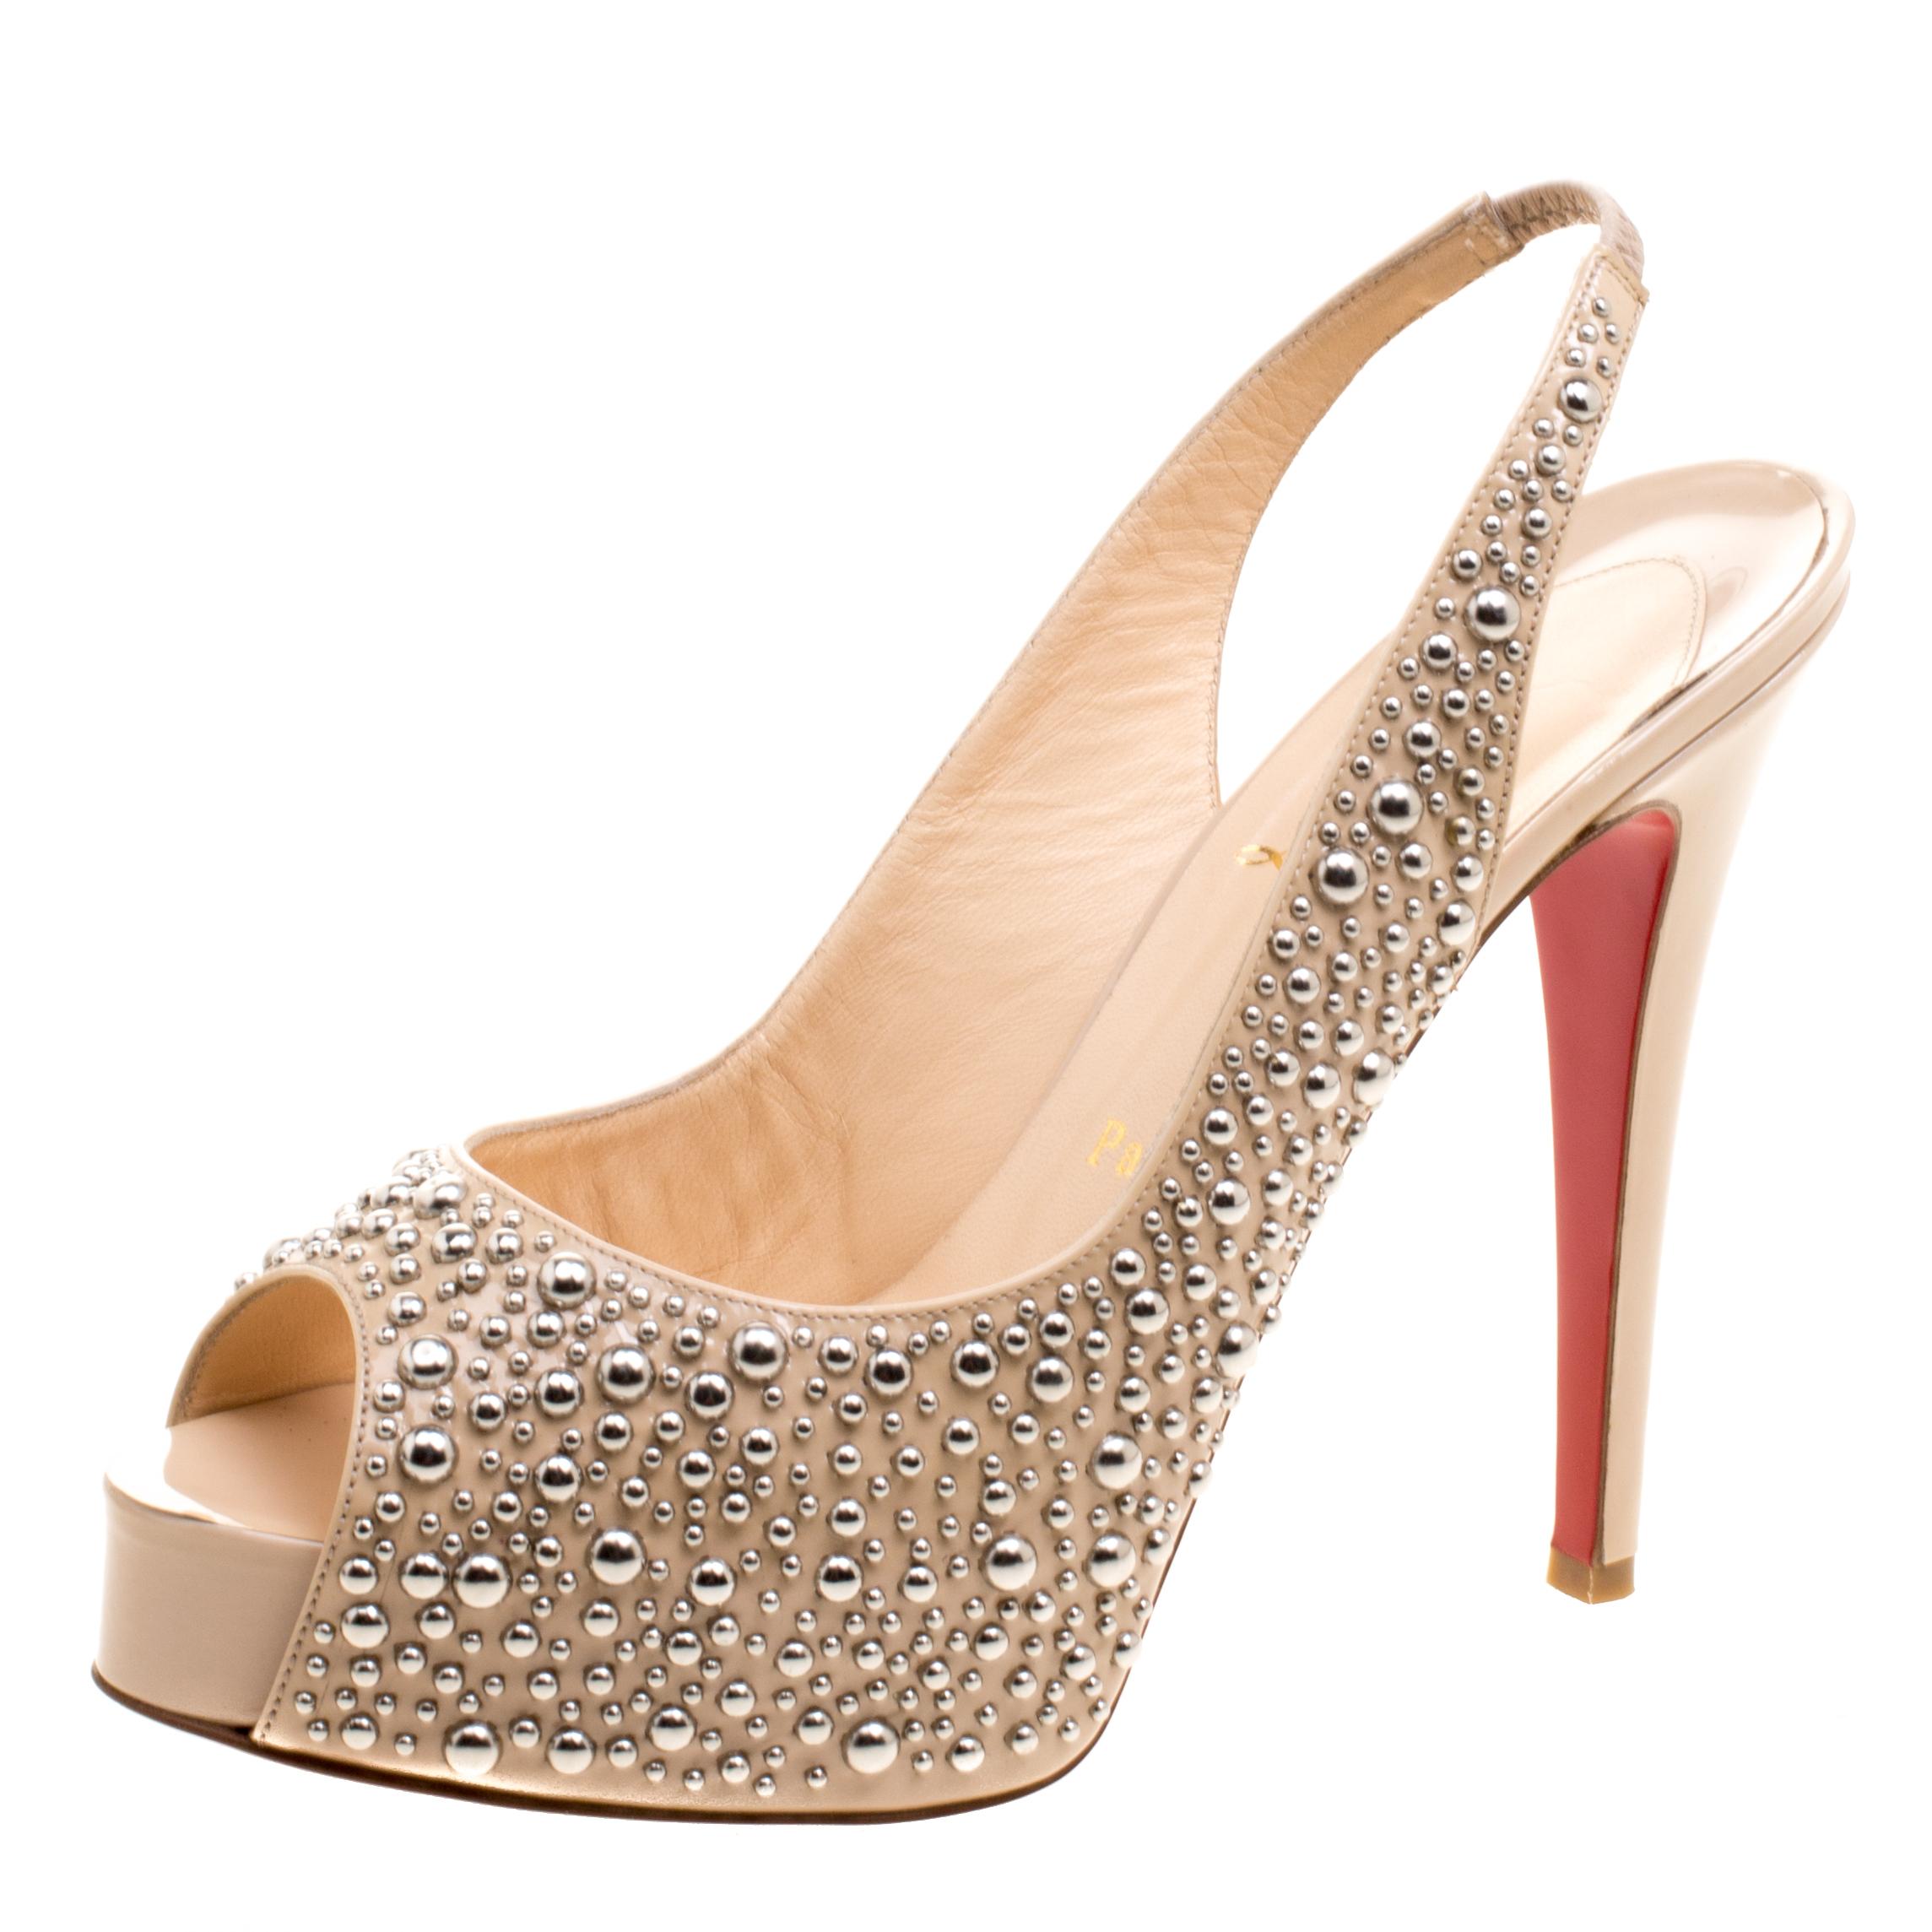 9ff77044bc02 ... Christian Louboutin Beige Studded Patent Leather Star Prive Peep Toe Slingback  Sandals Size 39. nextprev. prevnext